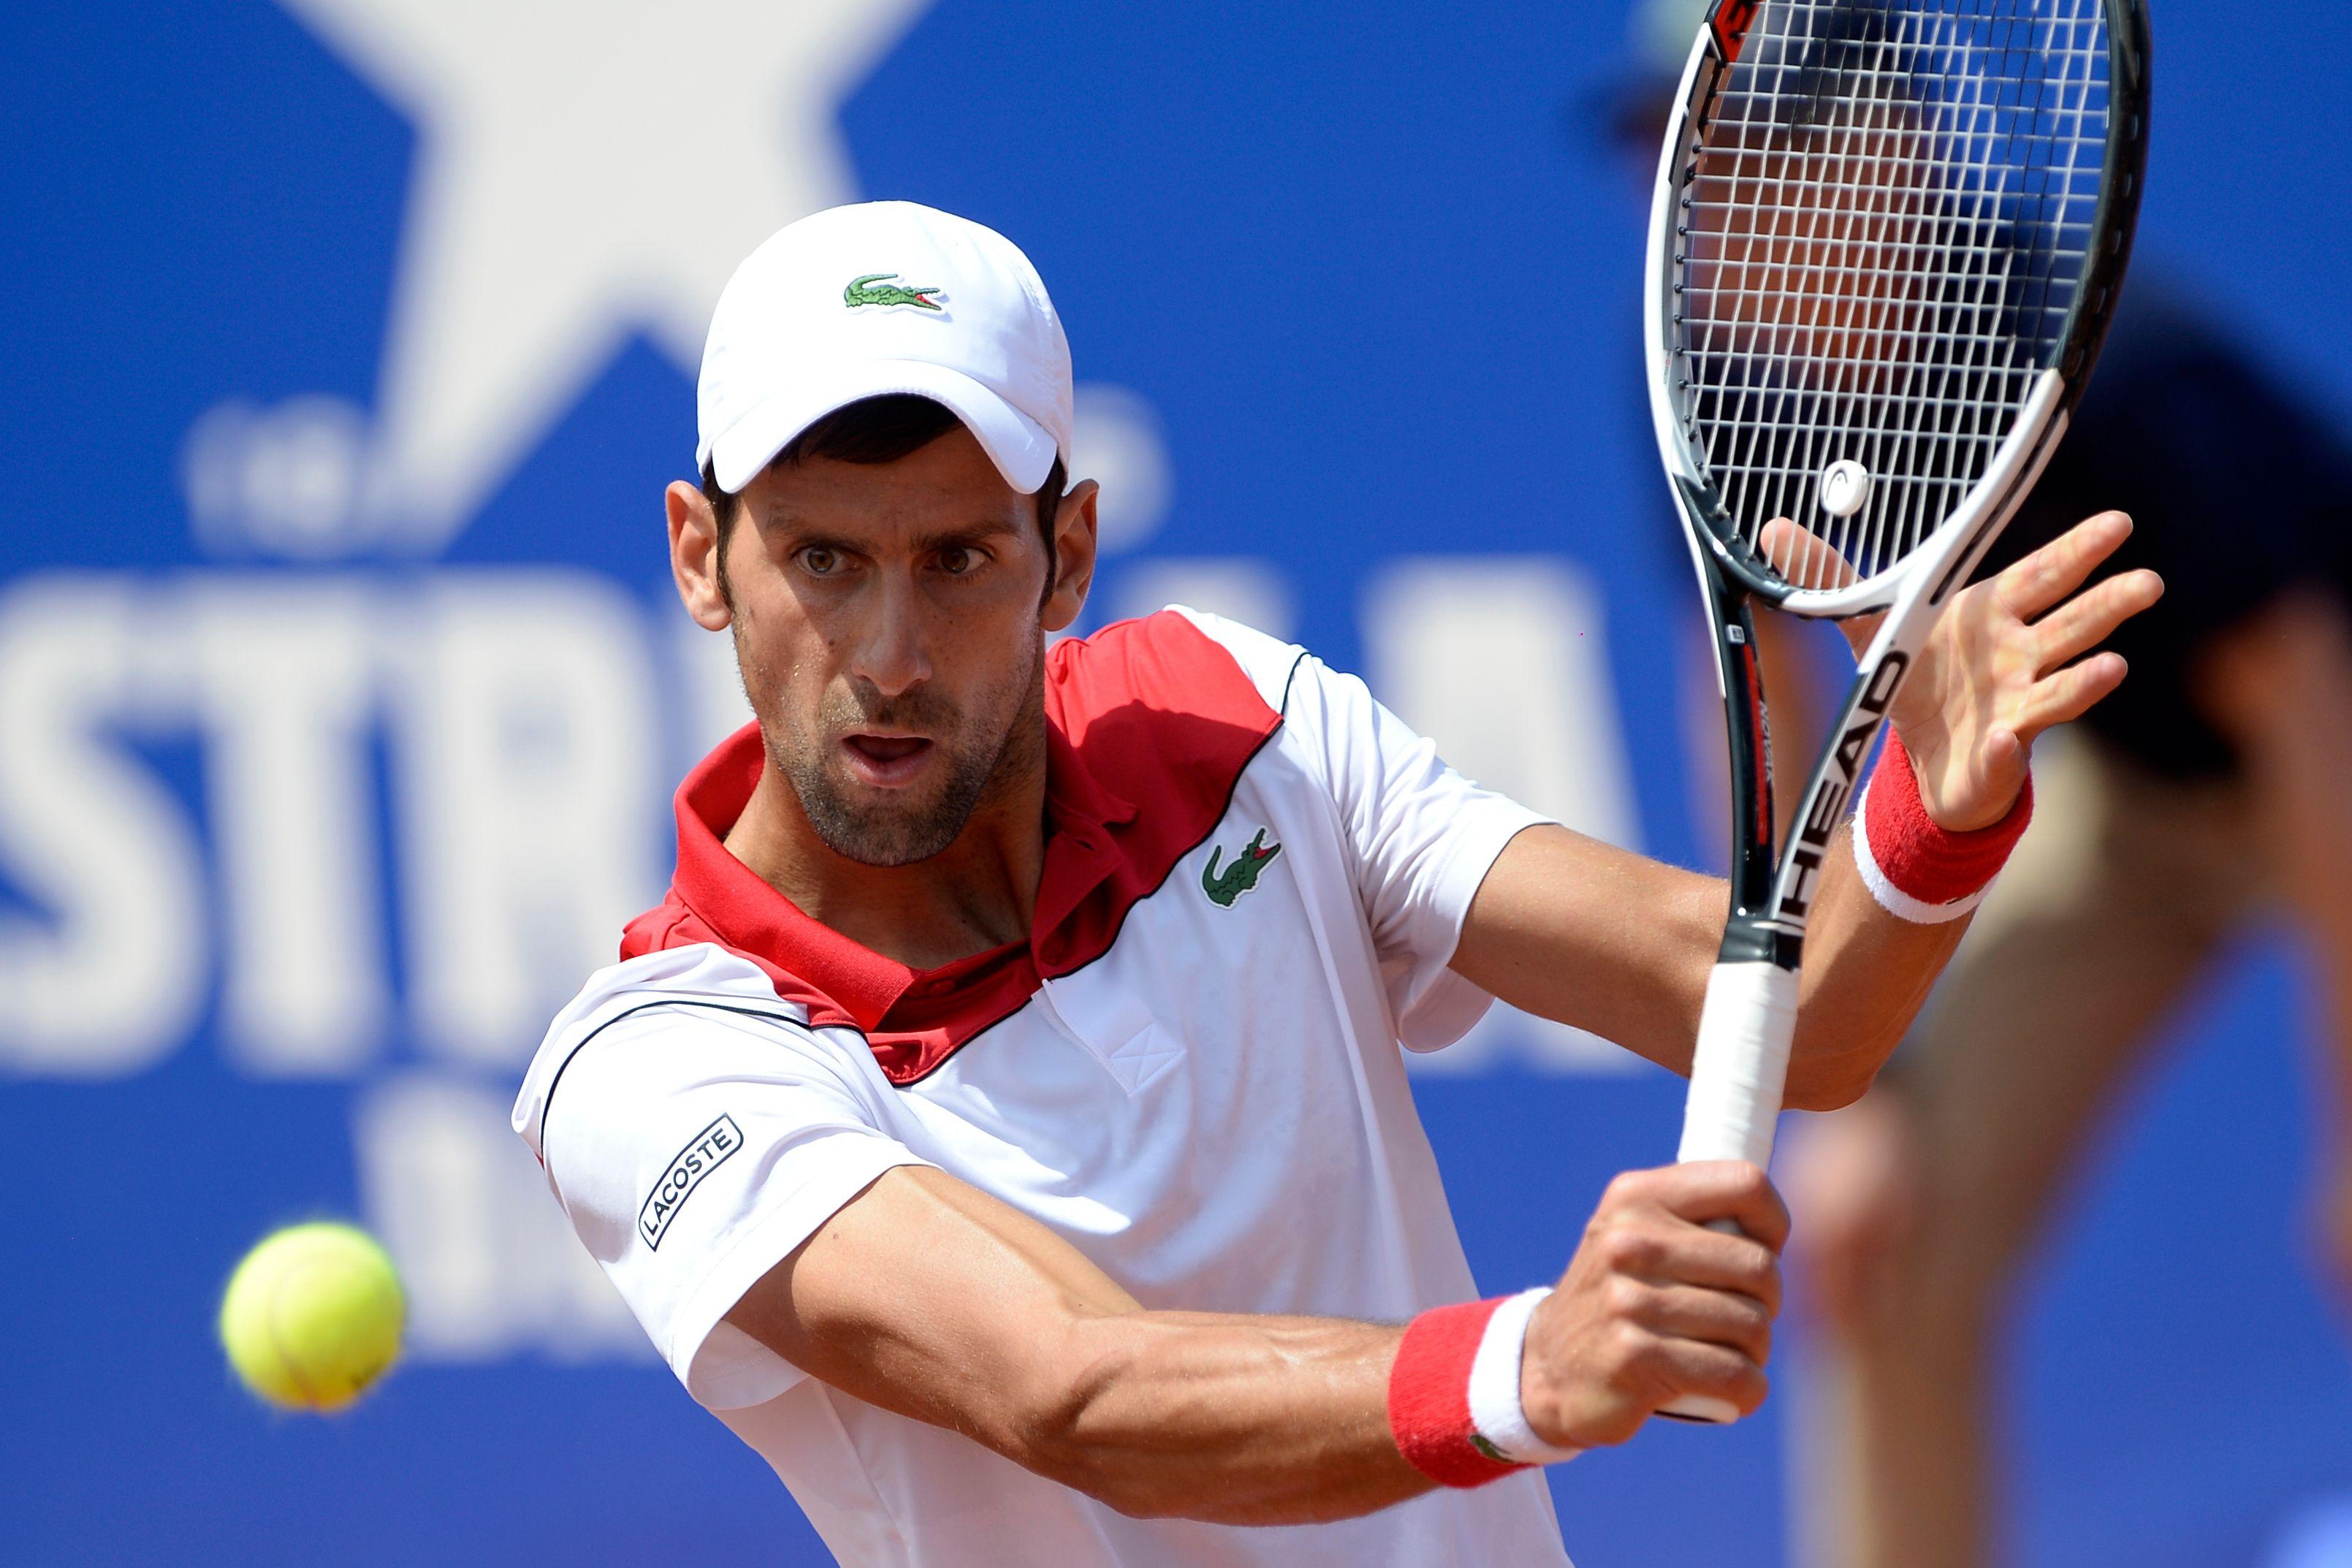 Tennis - ATP - La (lourde) rechute de Djokovic sur la route de Roland-Garros